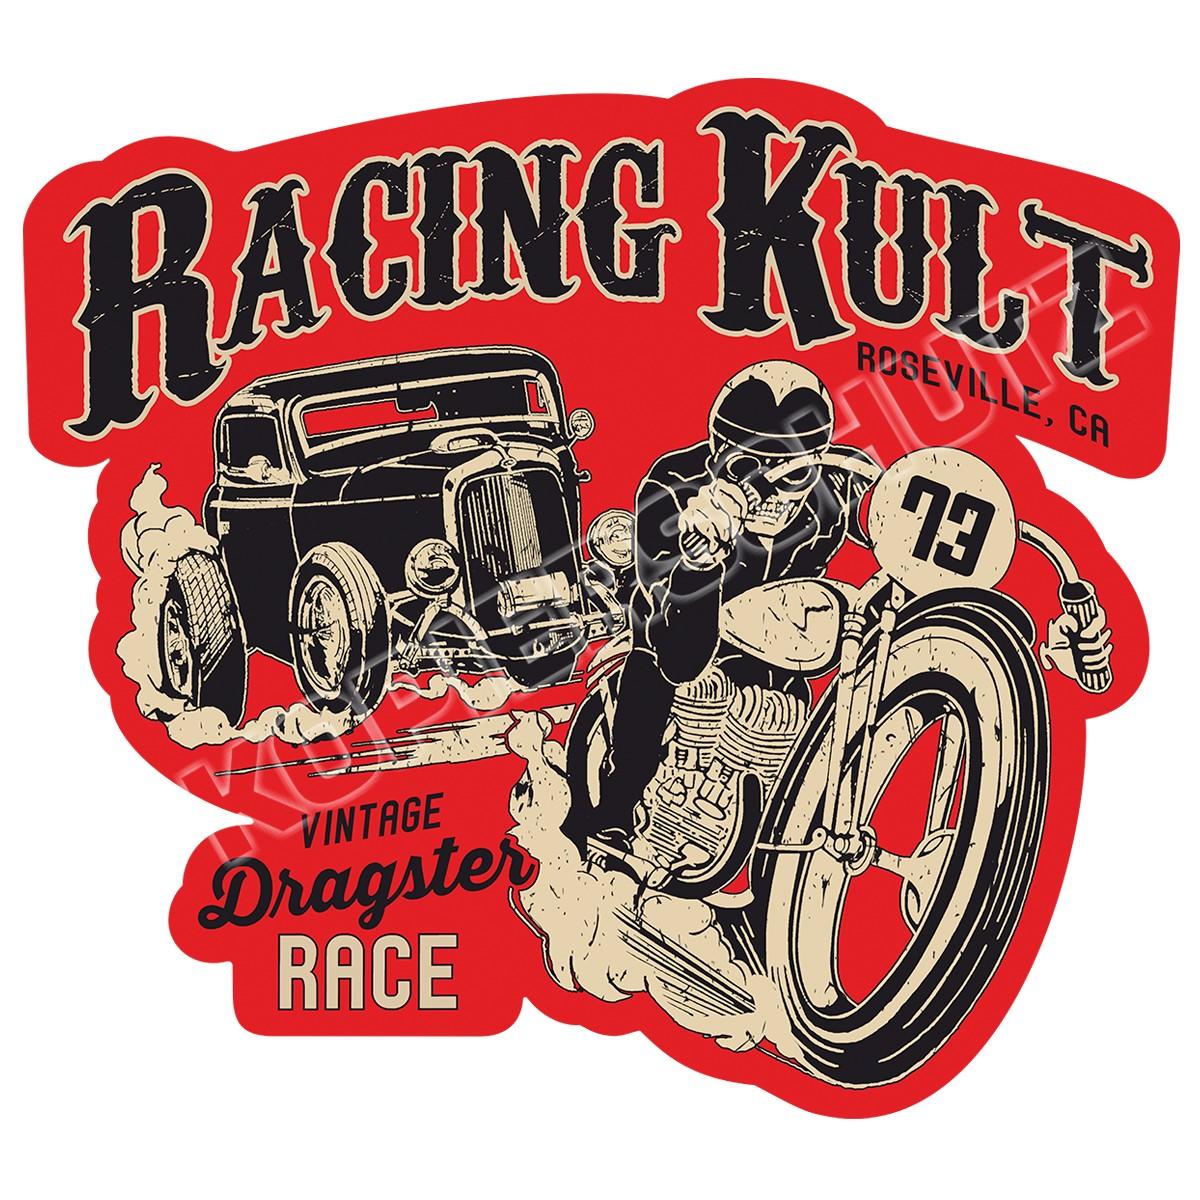 Racing Kult Aufkleber Dragster Race Sticker in verschiedenen Größen